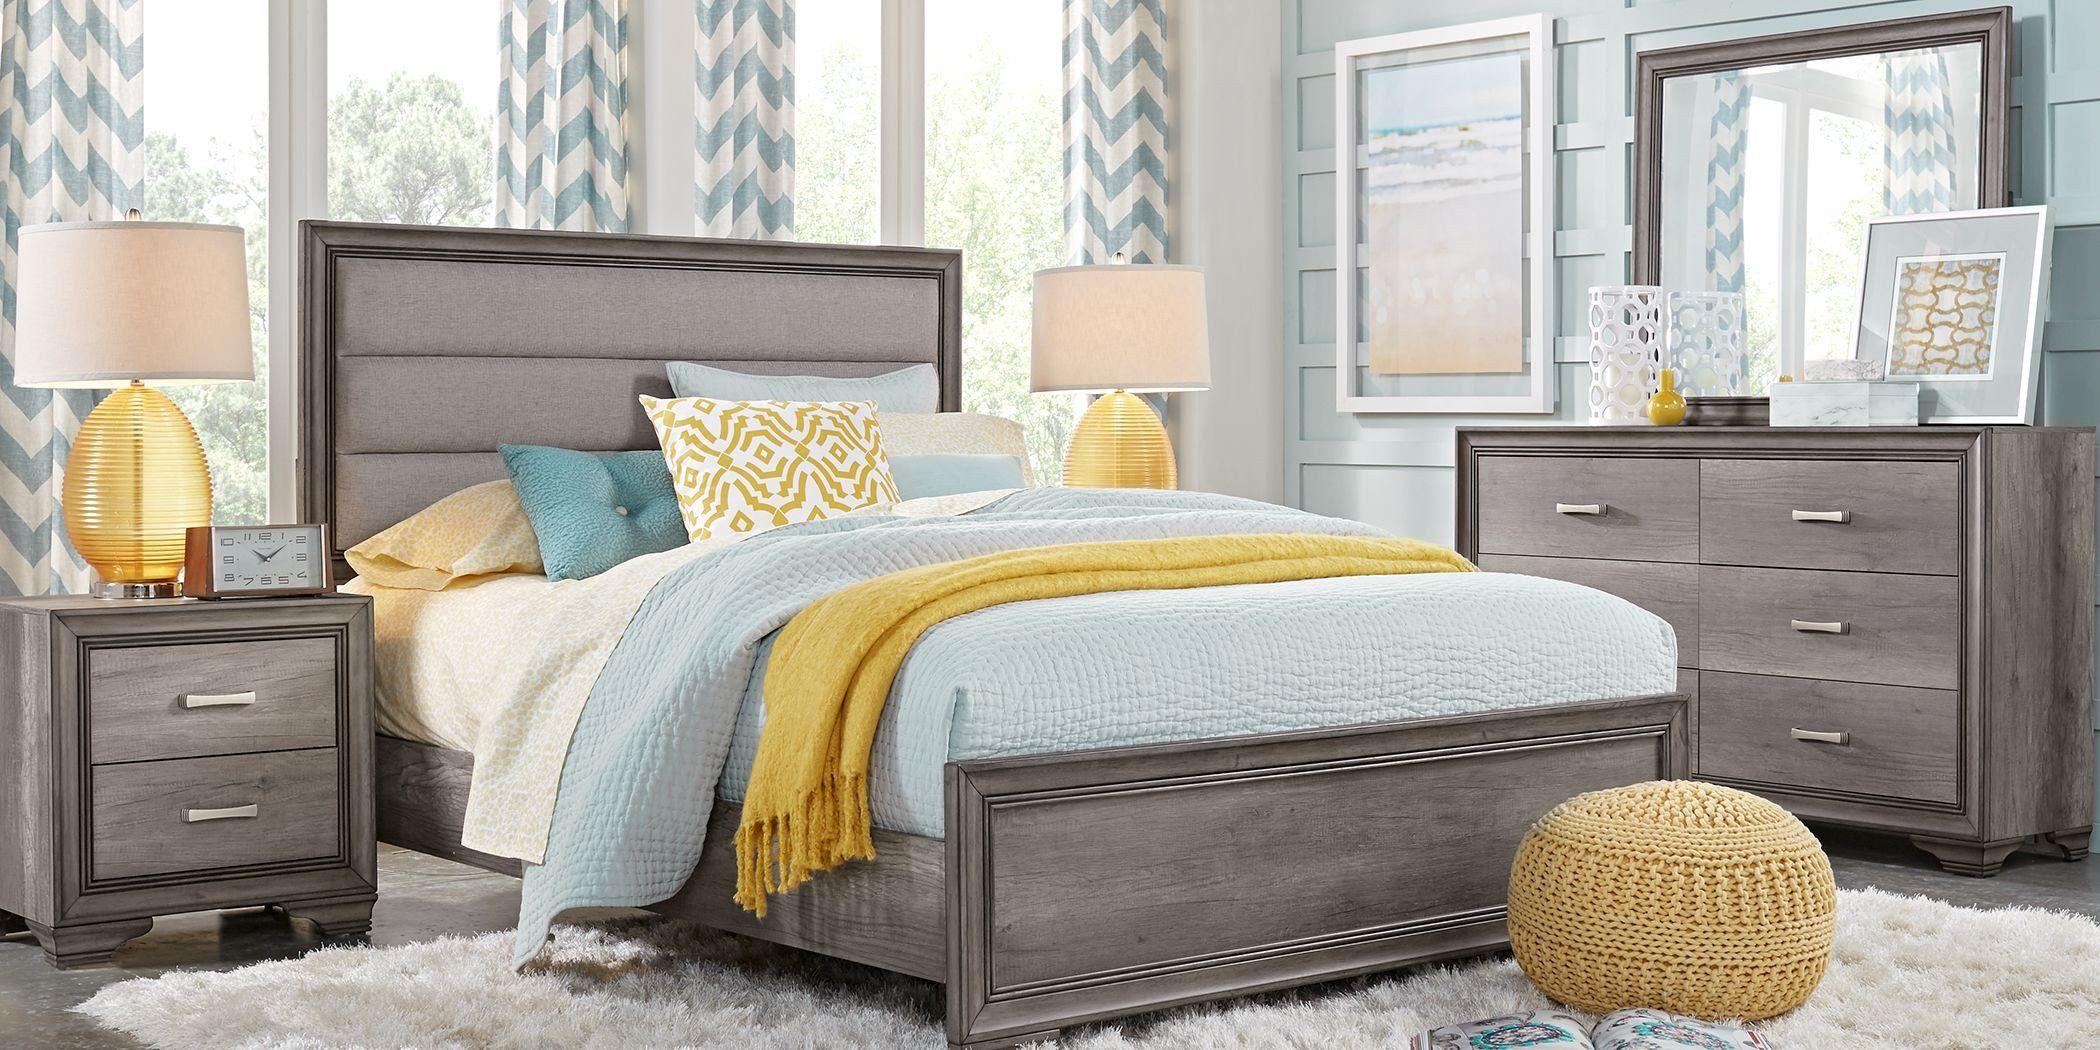 Rooms To Go Wall Decor In 2020 Bedroom Sets Queen King Bedroom Sets Bedroom Panel